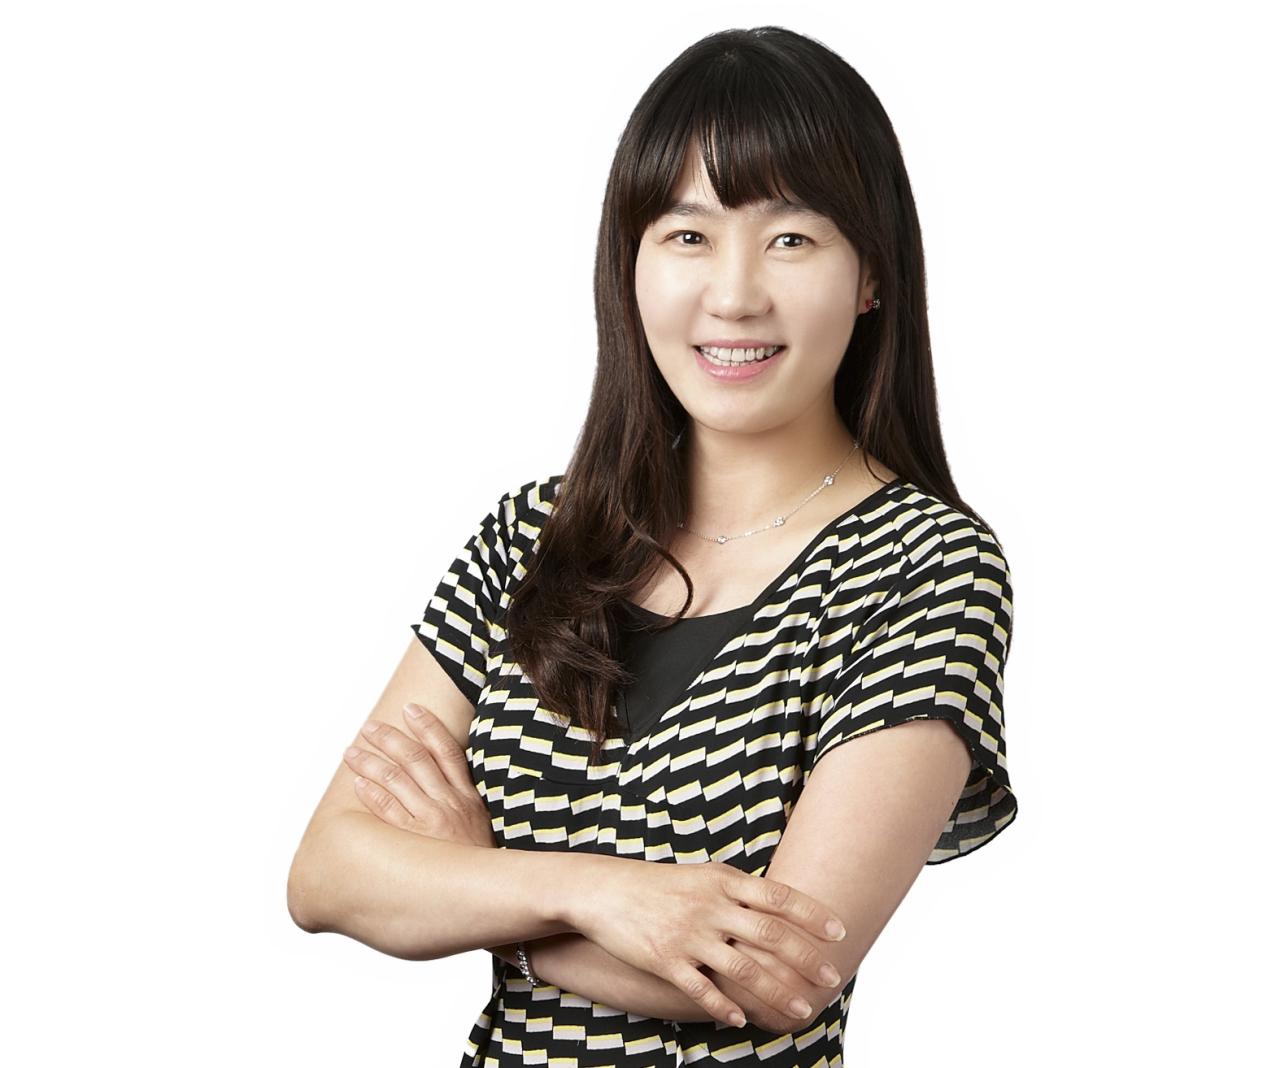 Mirae Asset Daewoo's Galleria WM branch managing director (PB) Seo Jae-yeon (Mirae Asset Daewoo)